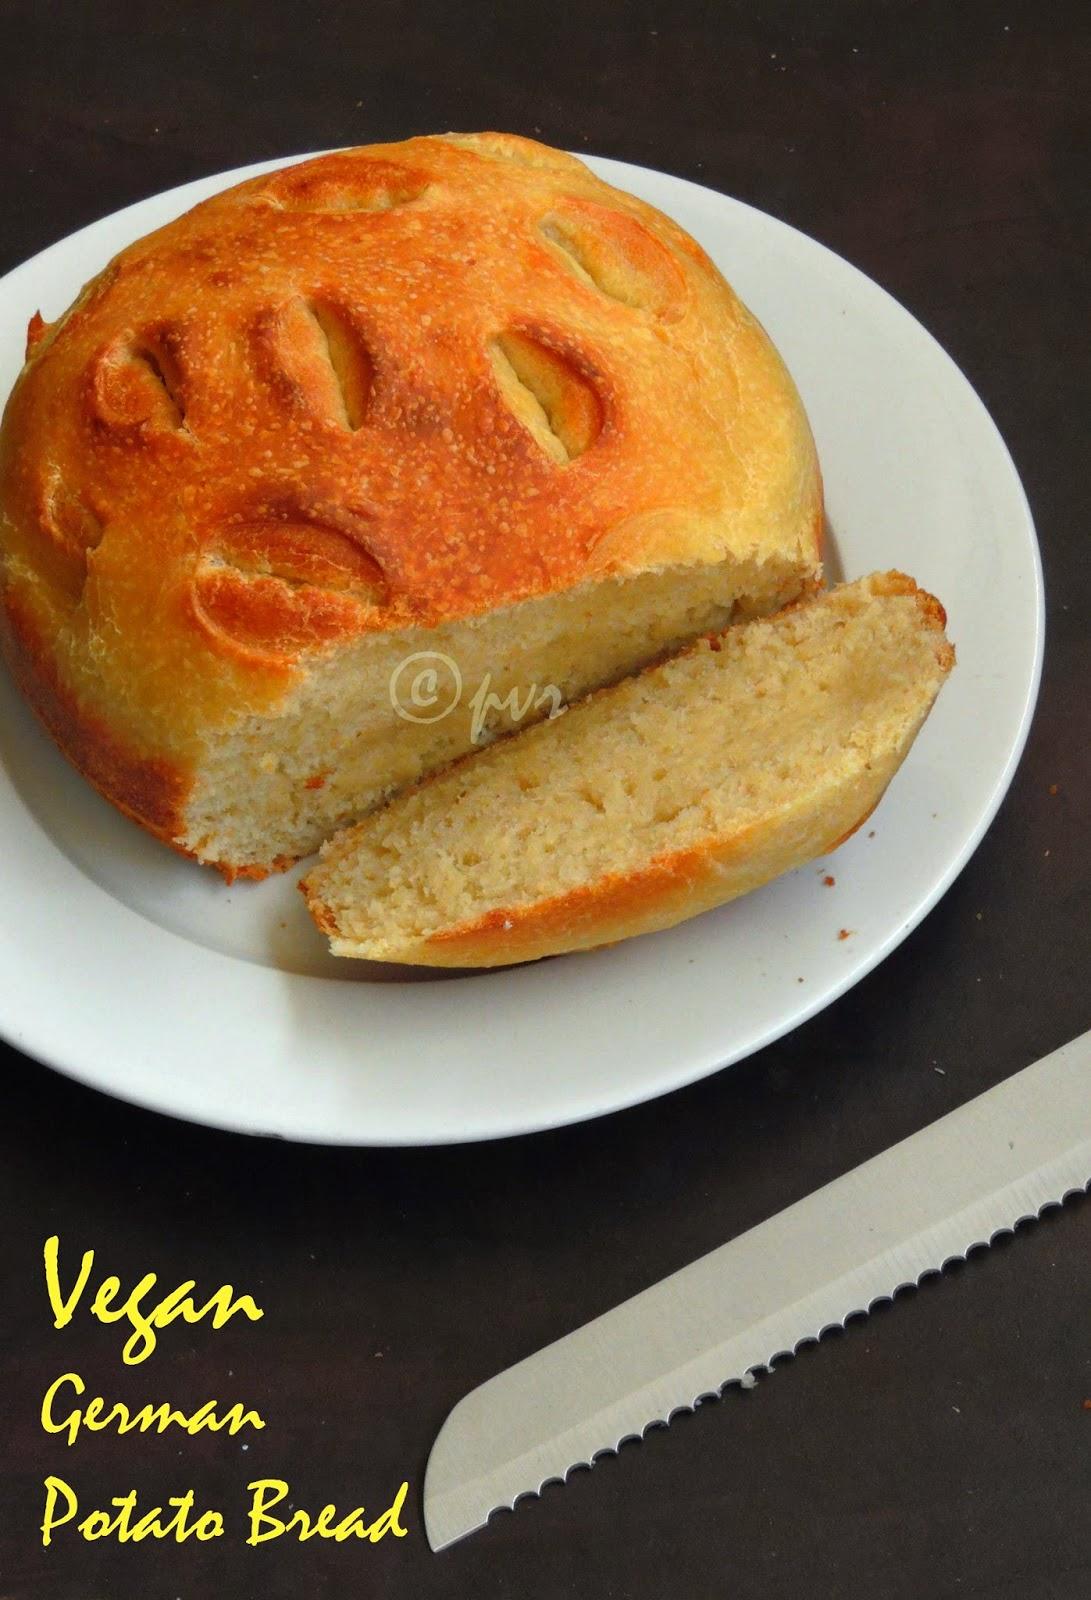 Vegan German Bread